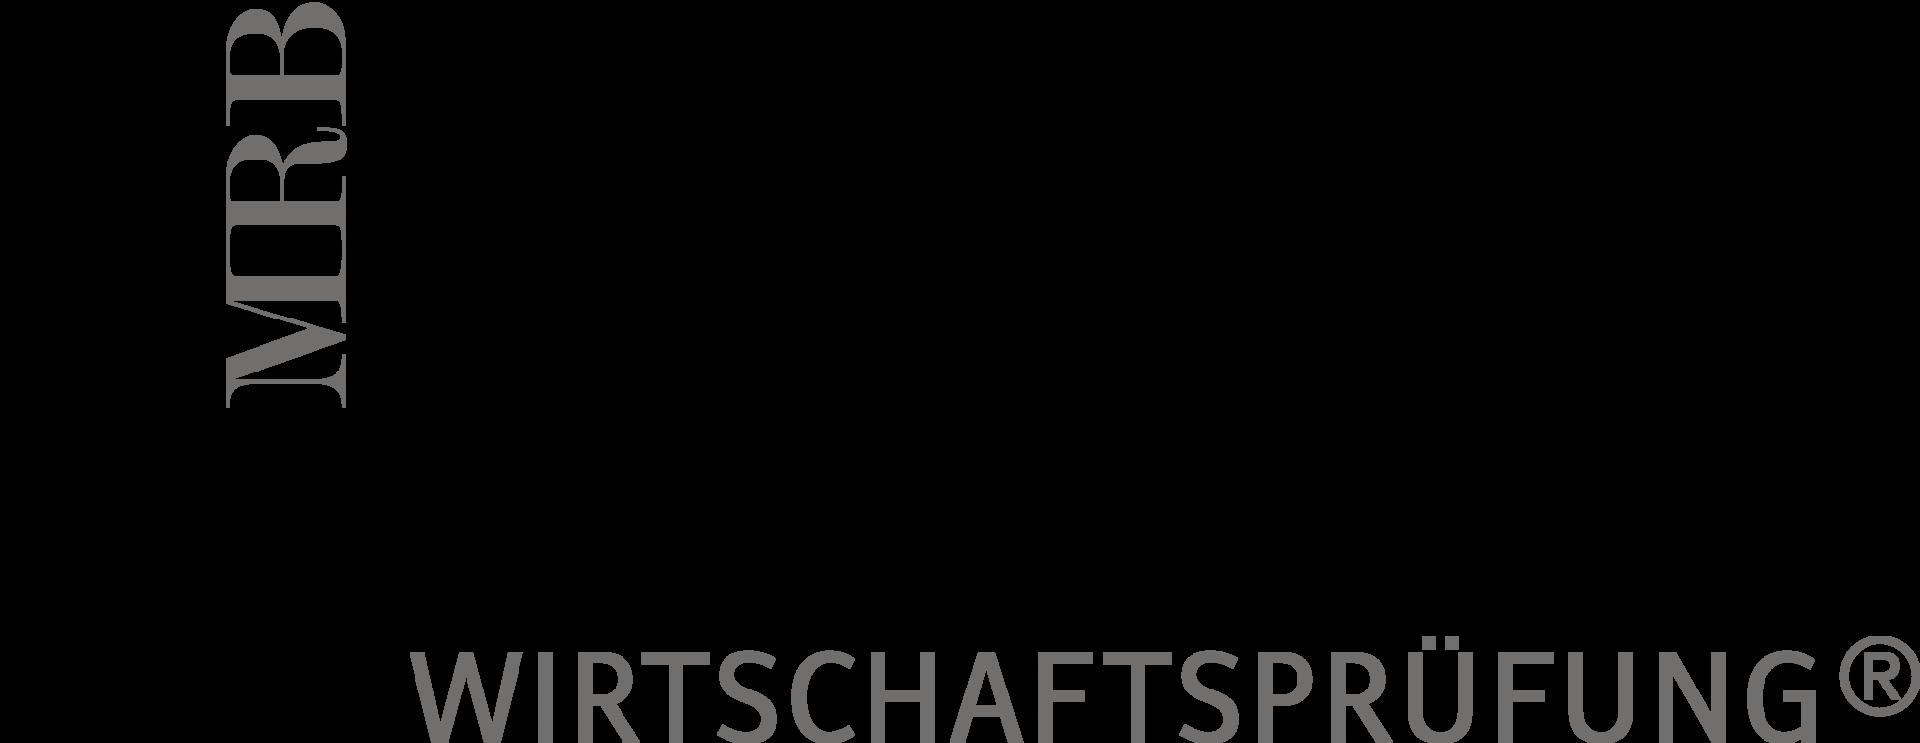 mrb Nr.1 Steuerberatung GmbH Wirtschaftsprüfungsgesellschaft